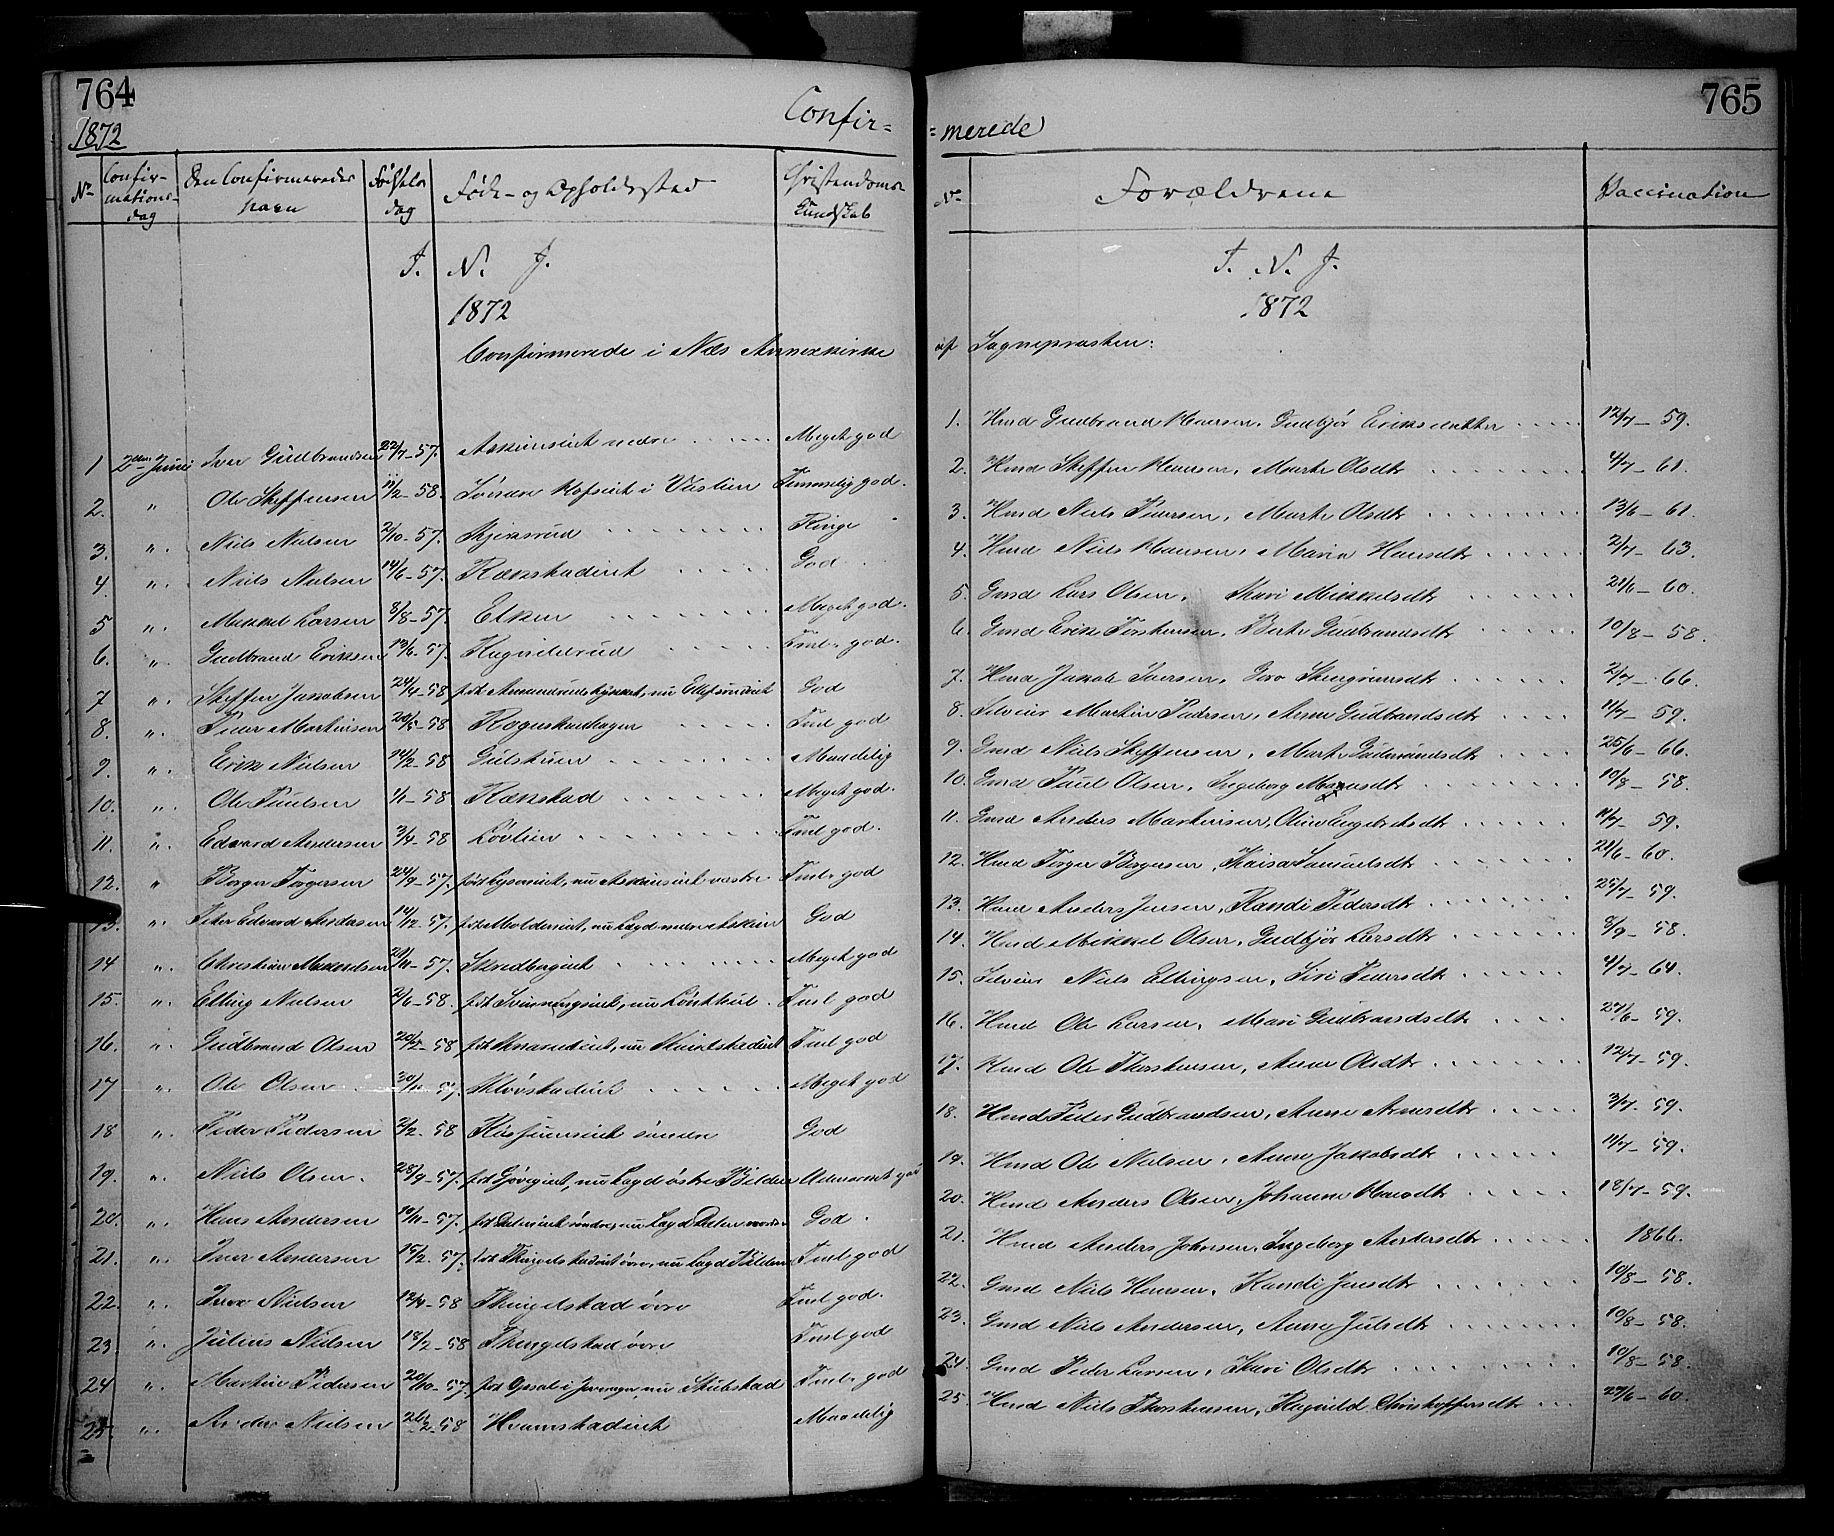 SAH, Gran prestekontor, Ministerialbok nr. 12, 1856-1874, s. 764-765